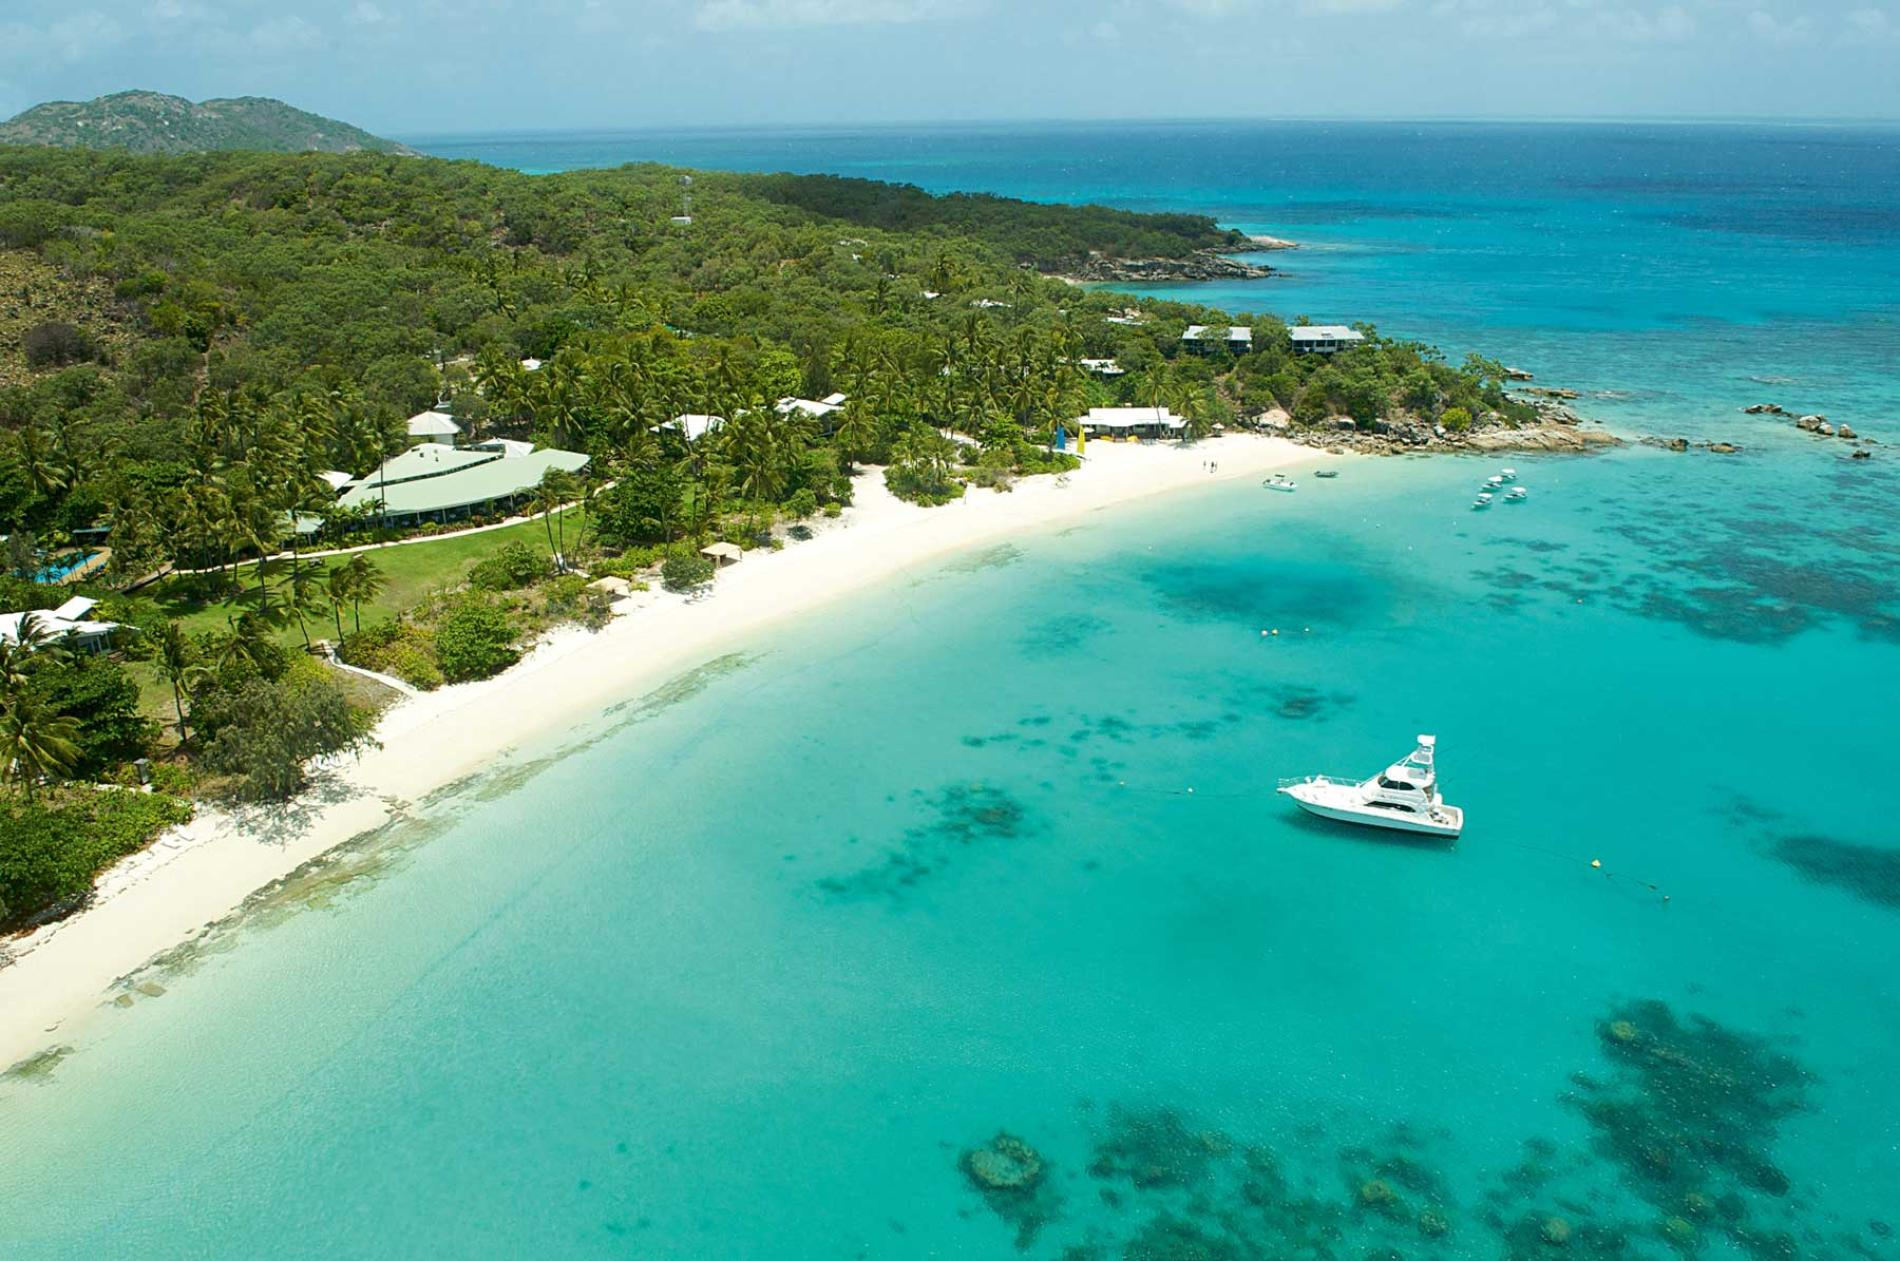 Viajar a Islas: Viajar a Lizard Island